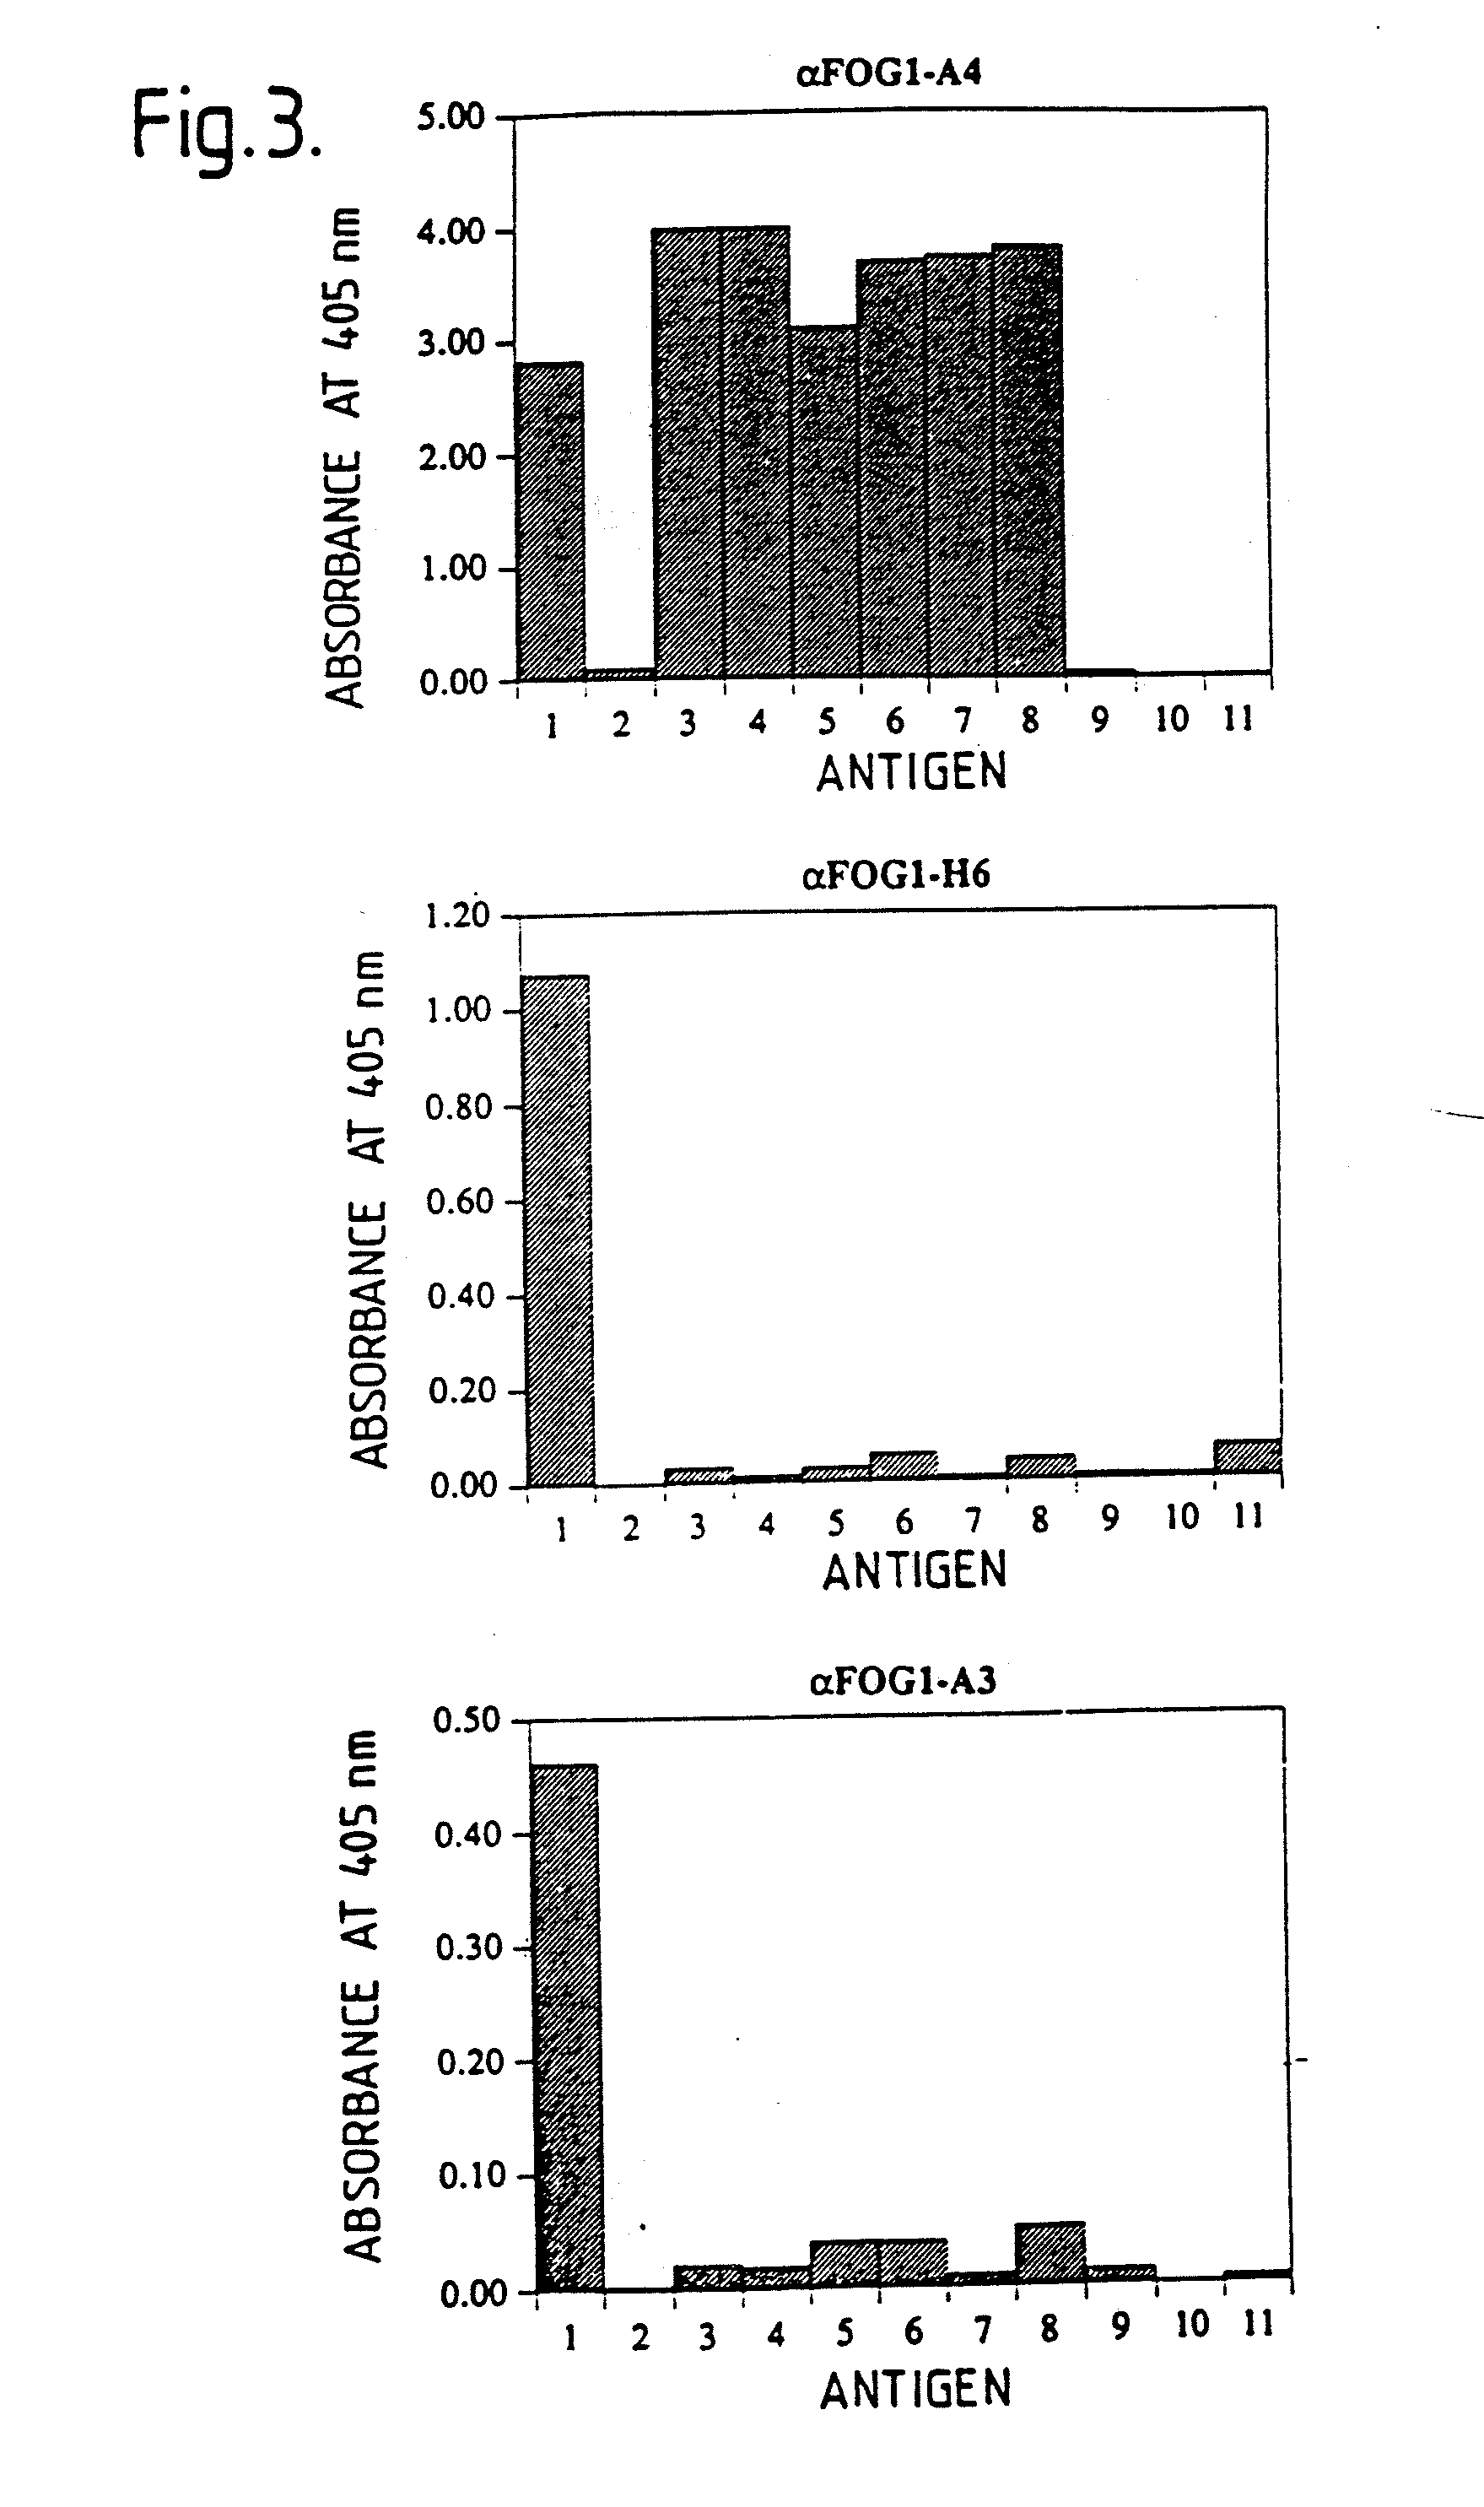 cn iii tipo de diabetes parálisis